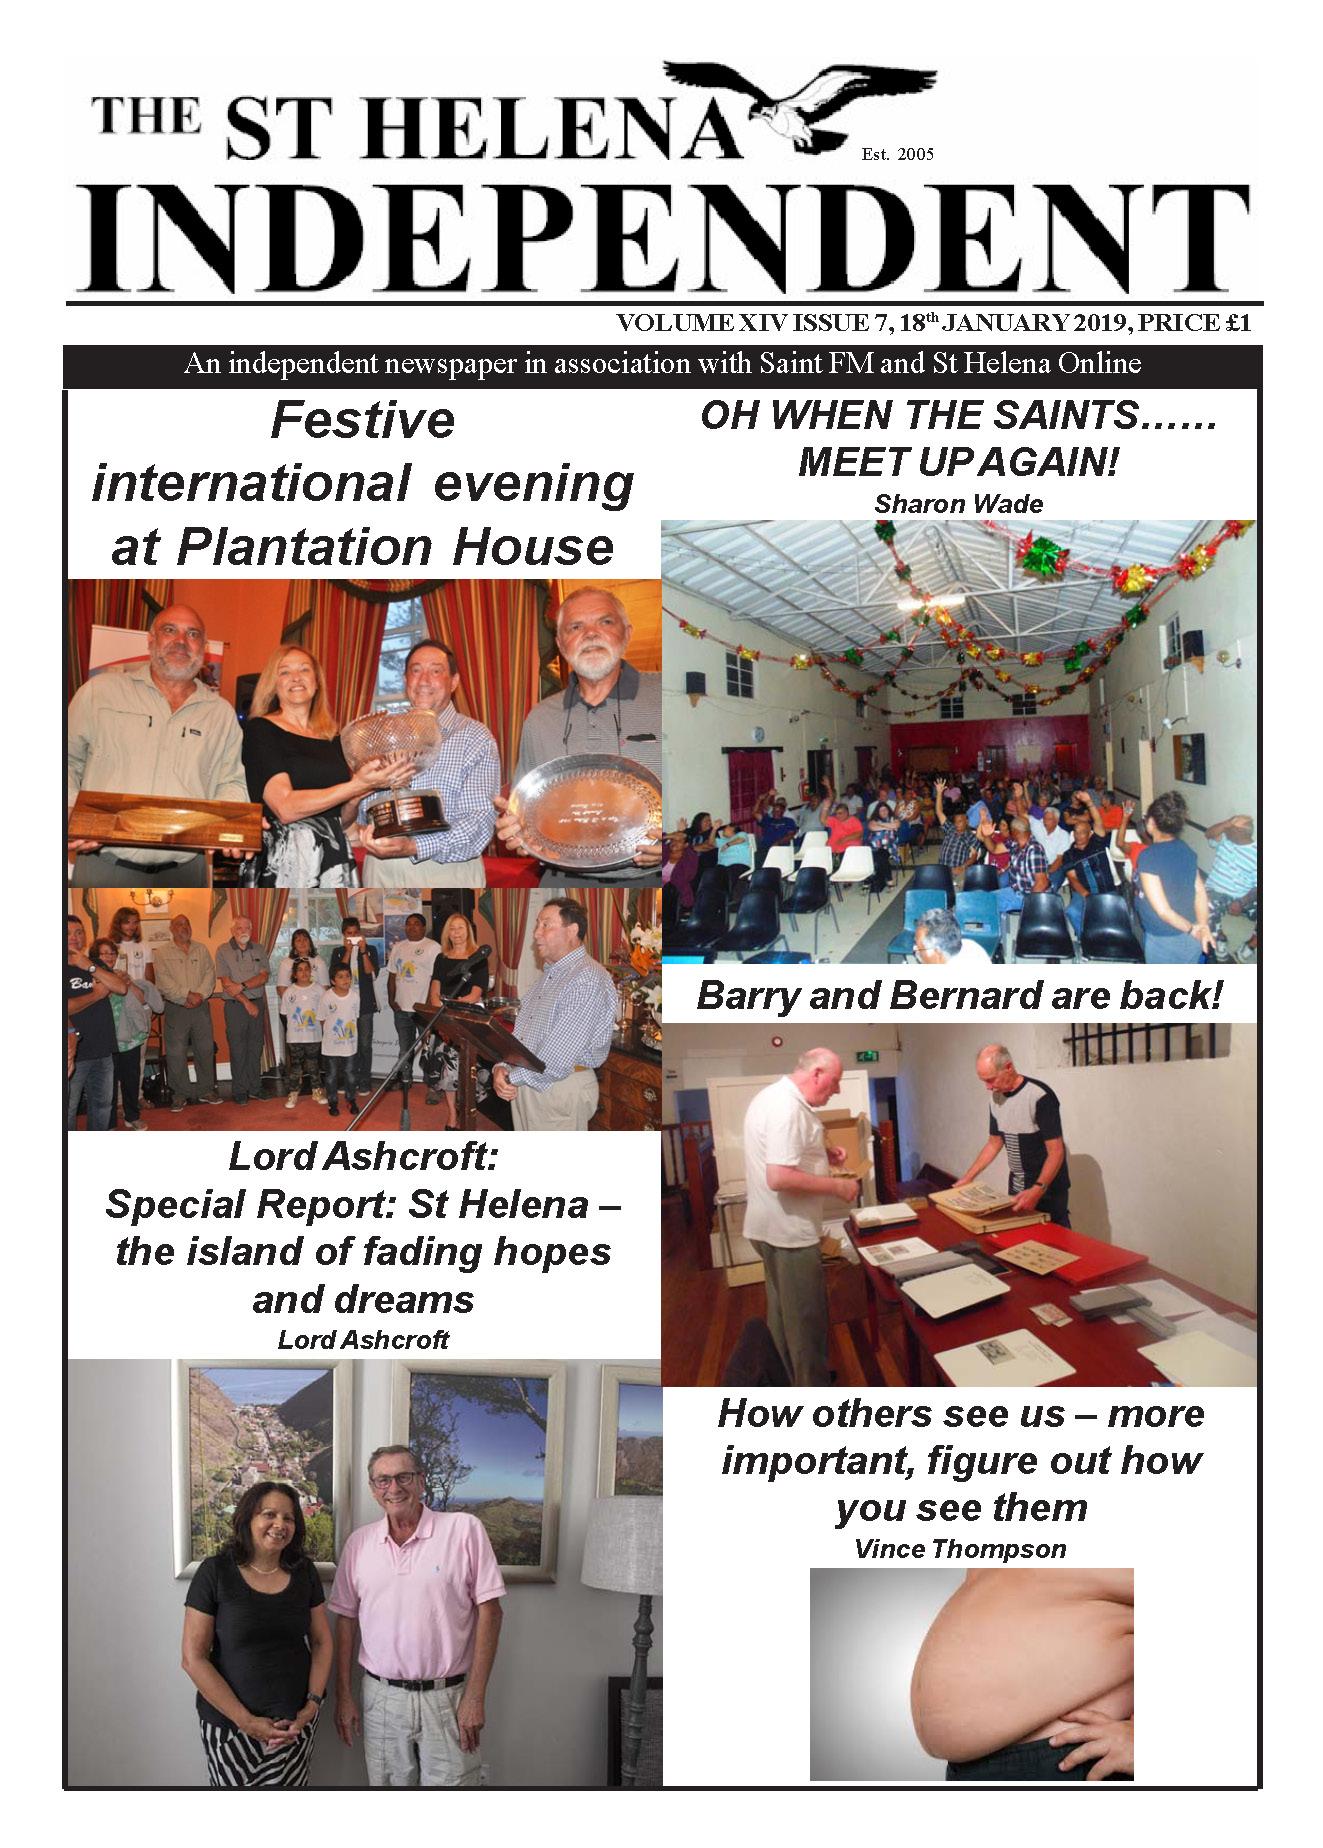 St Helena Independent 20190118